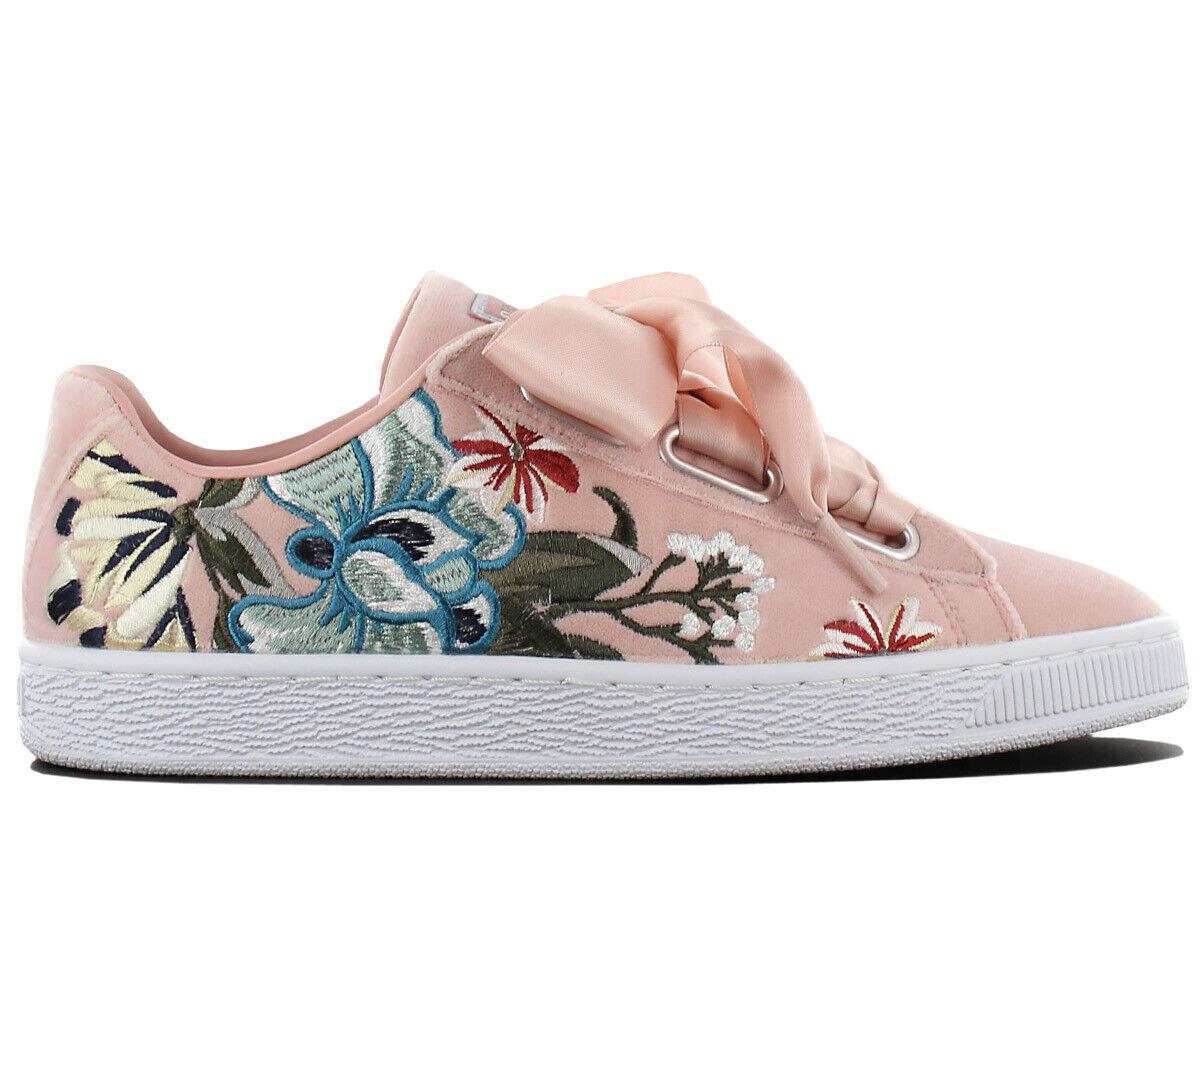 PUMA Basket Heart HYPER FLOWER EMB scarpe scarpe scarpe da ginnastica Donna Scarpe Da Ginnastica 366116-02 NUOVO 32ab3c